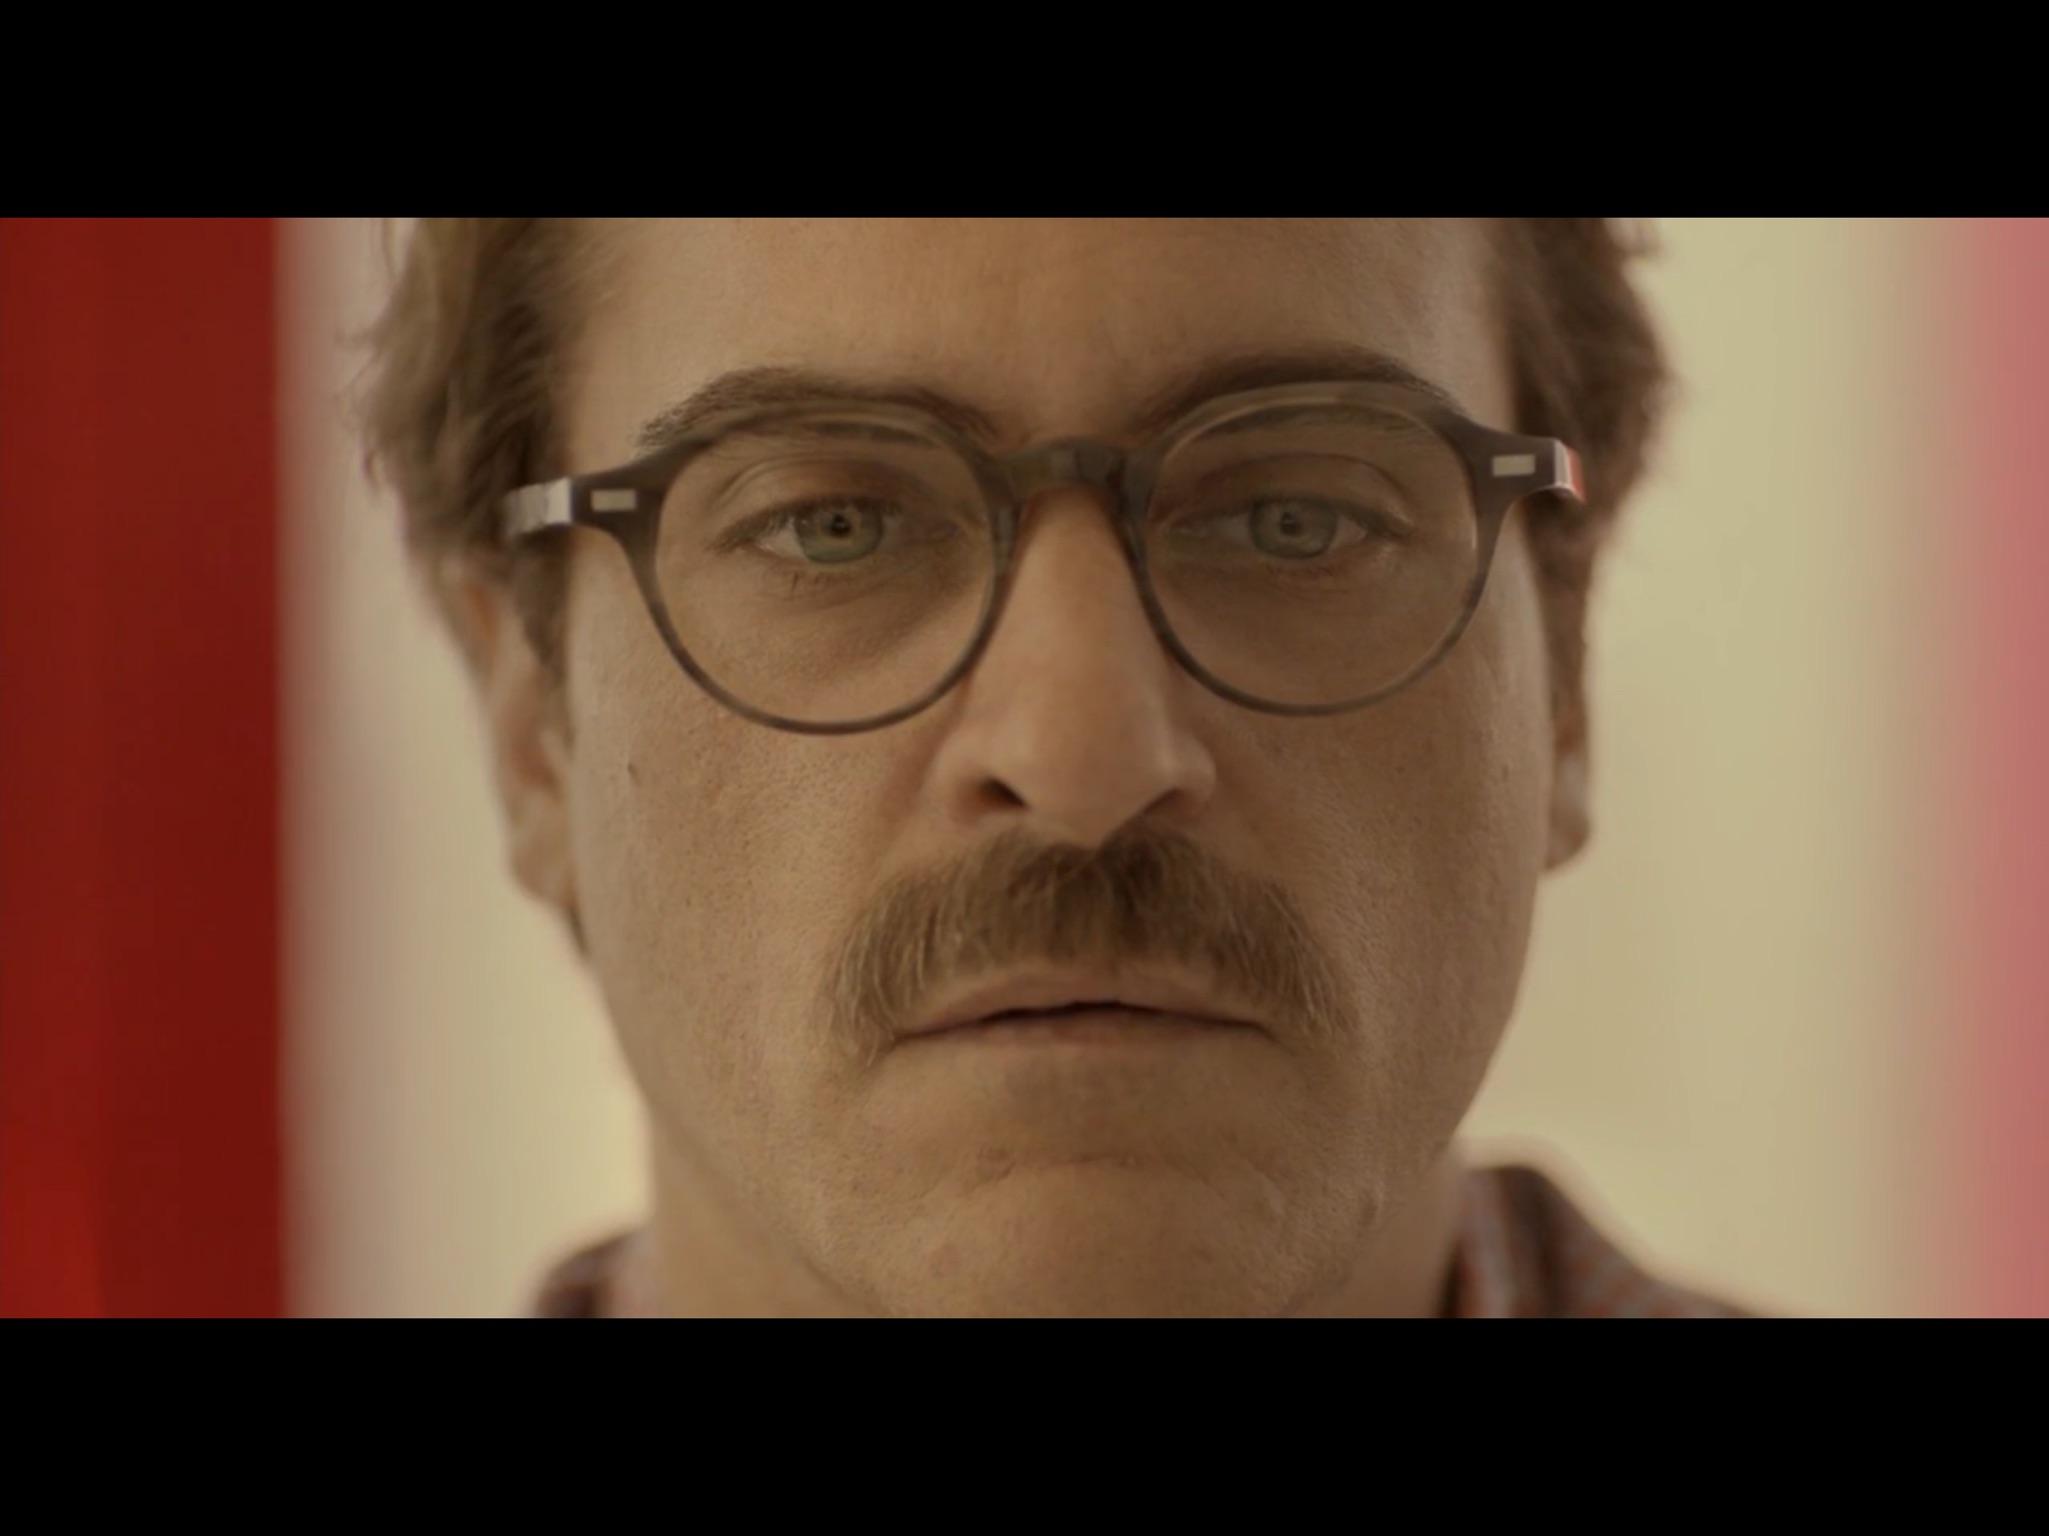 her-movie-2013-screencap-2.JPG